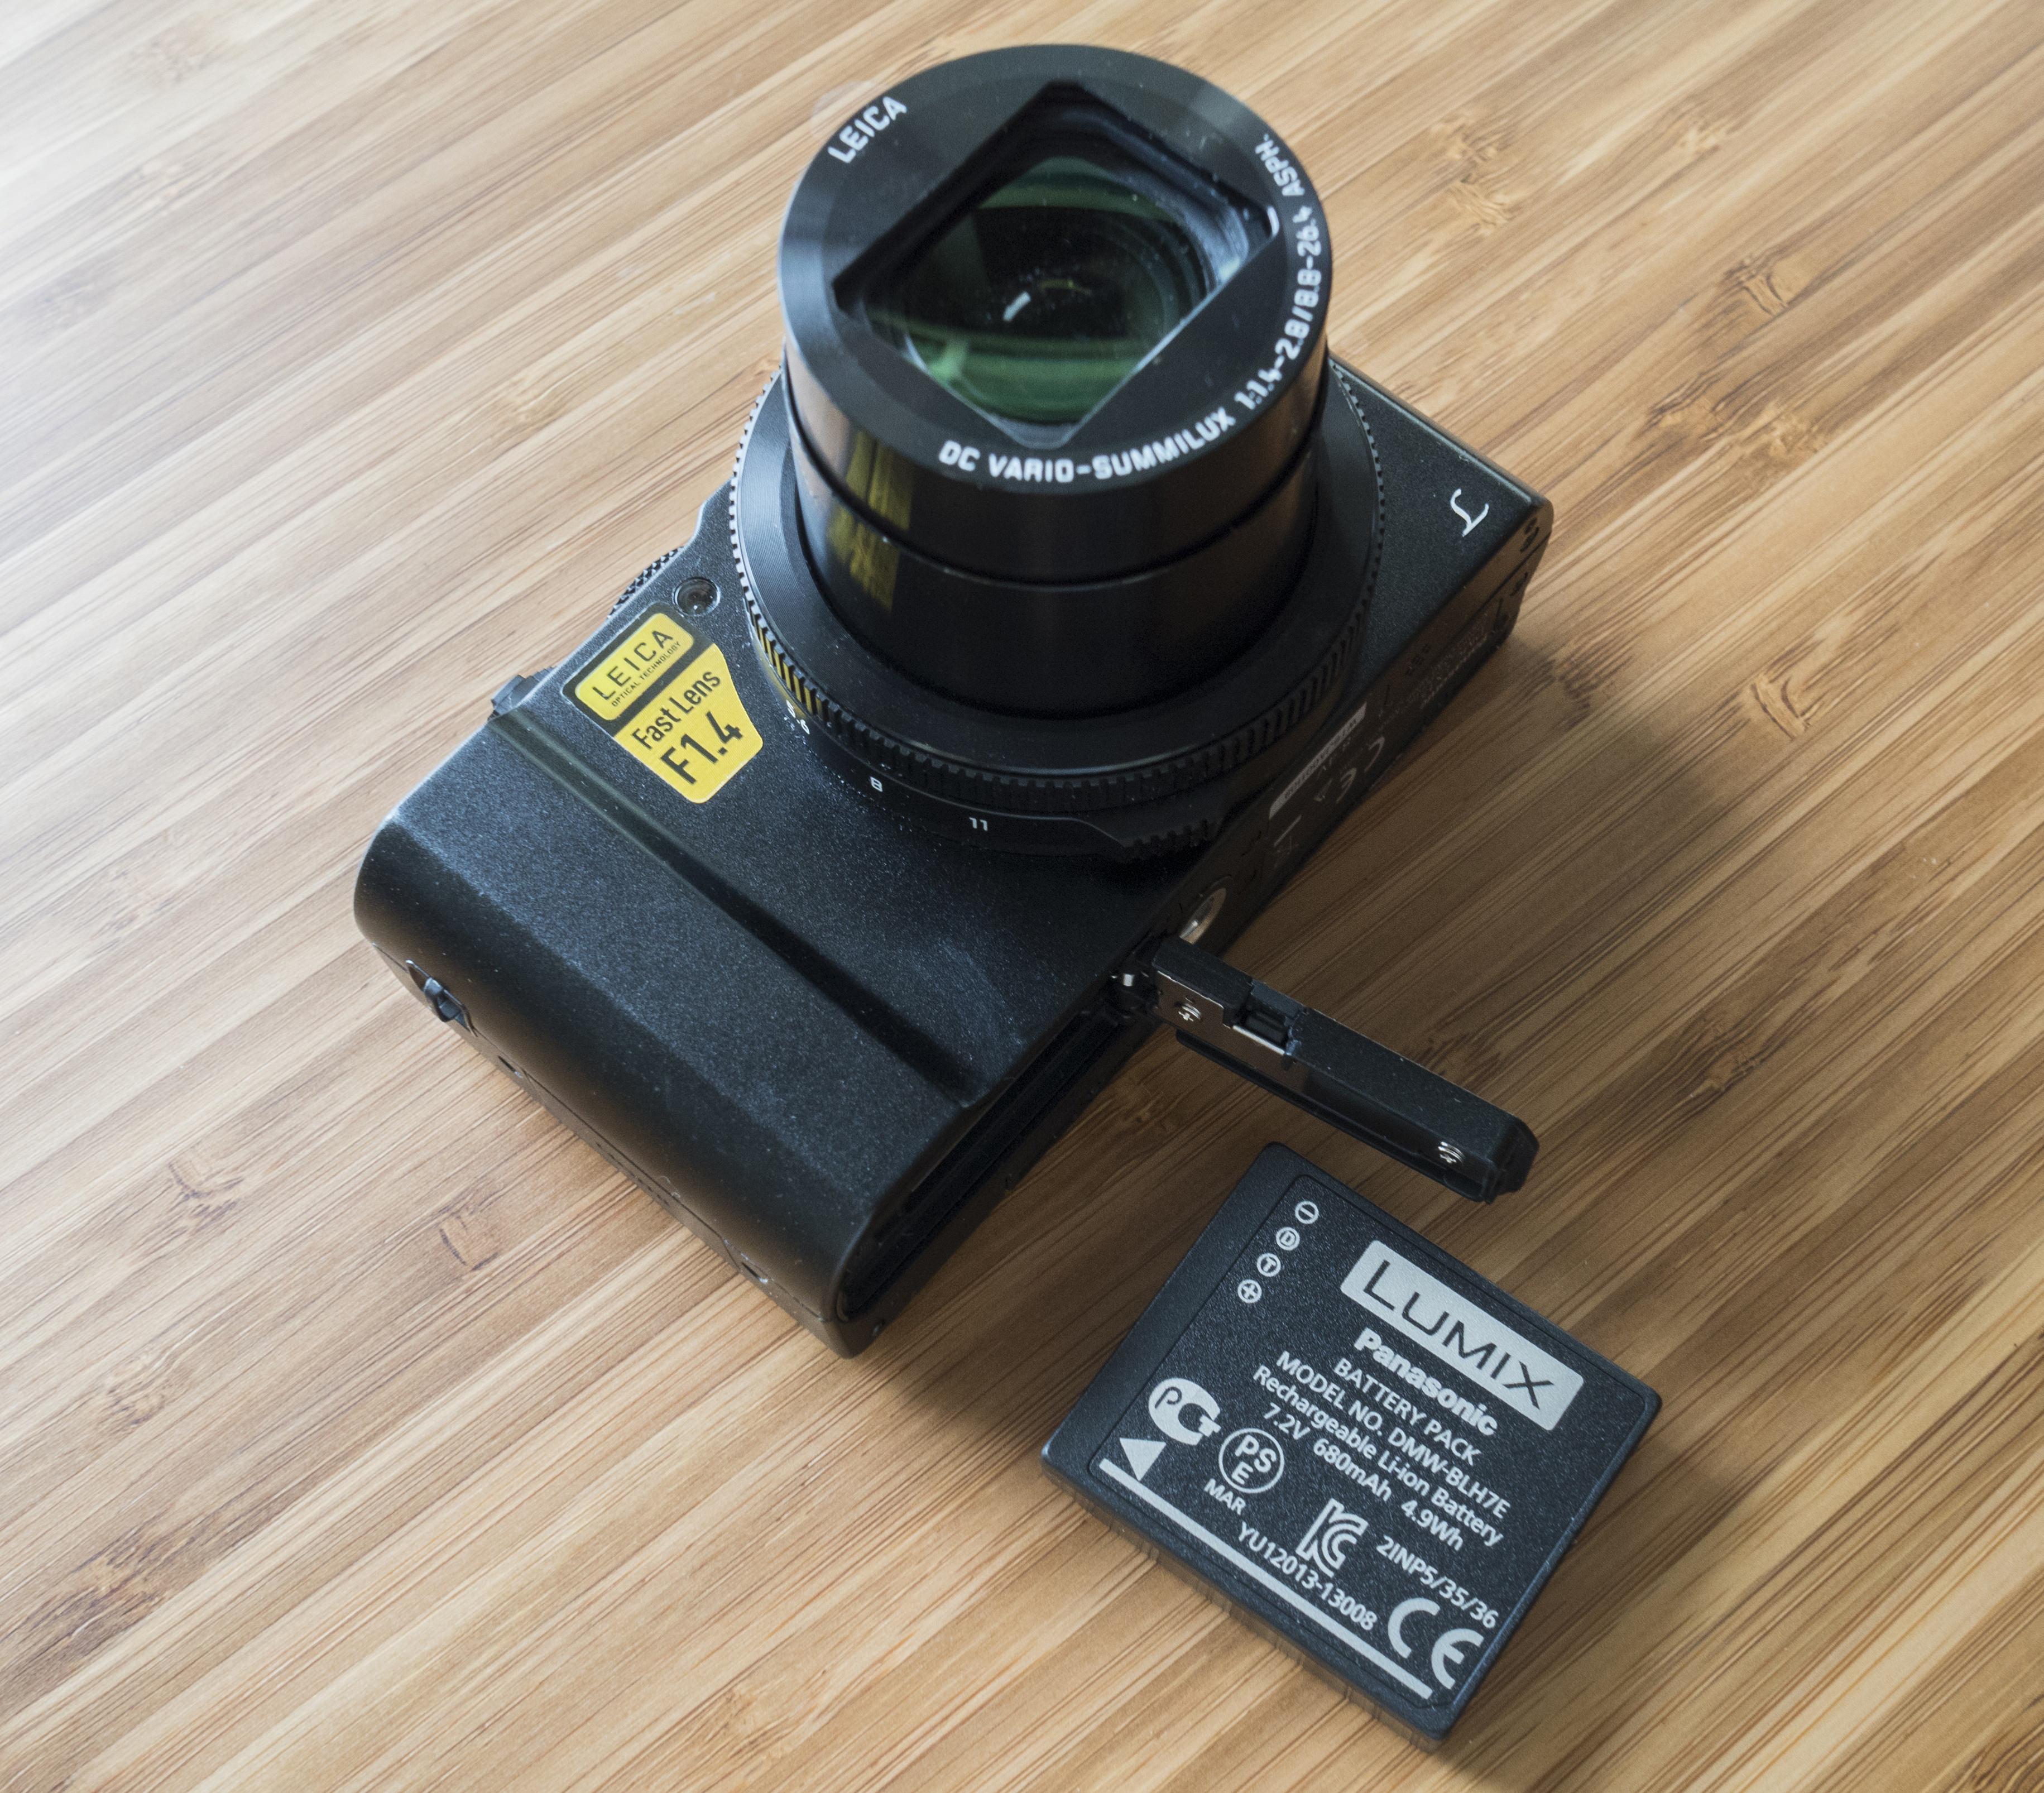 10 Photos 15 Reviews: Panasonic Lumix LX15 (LX10) Review